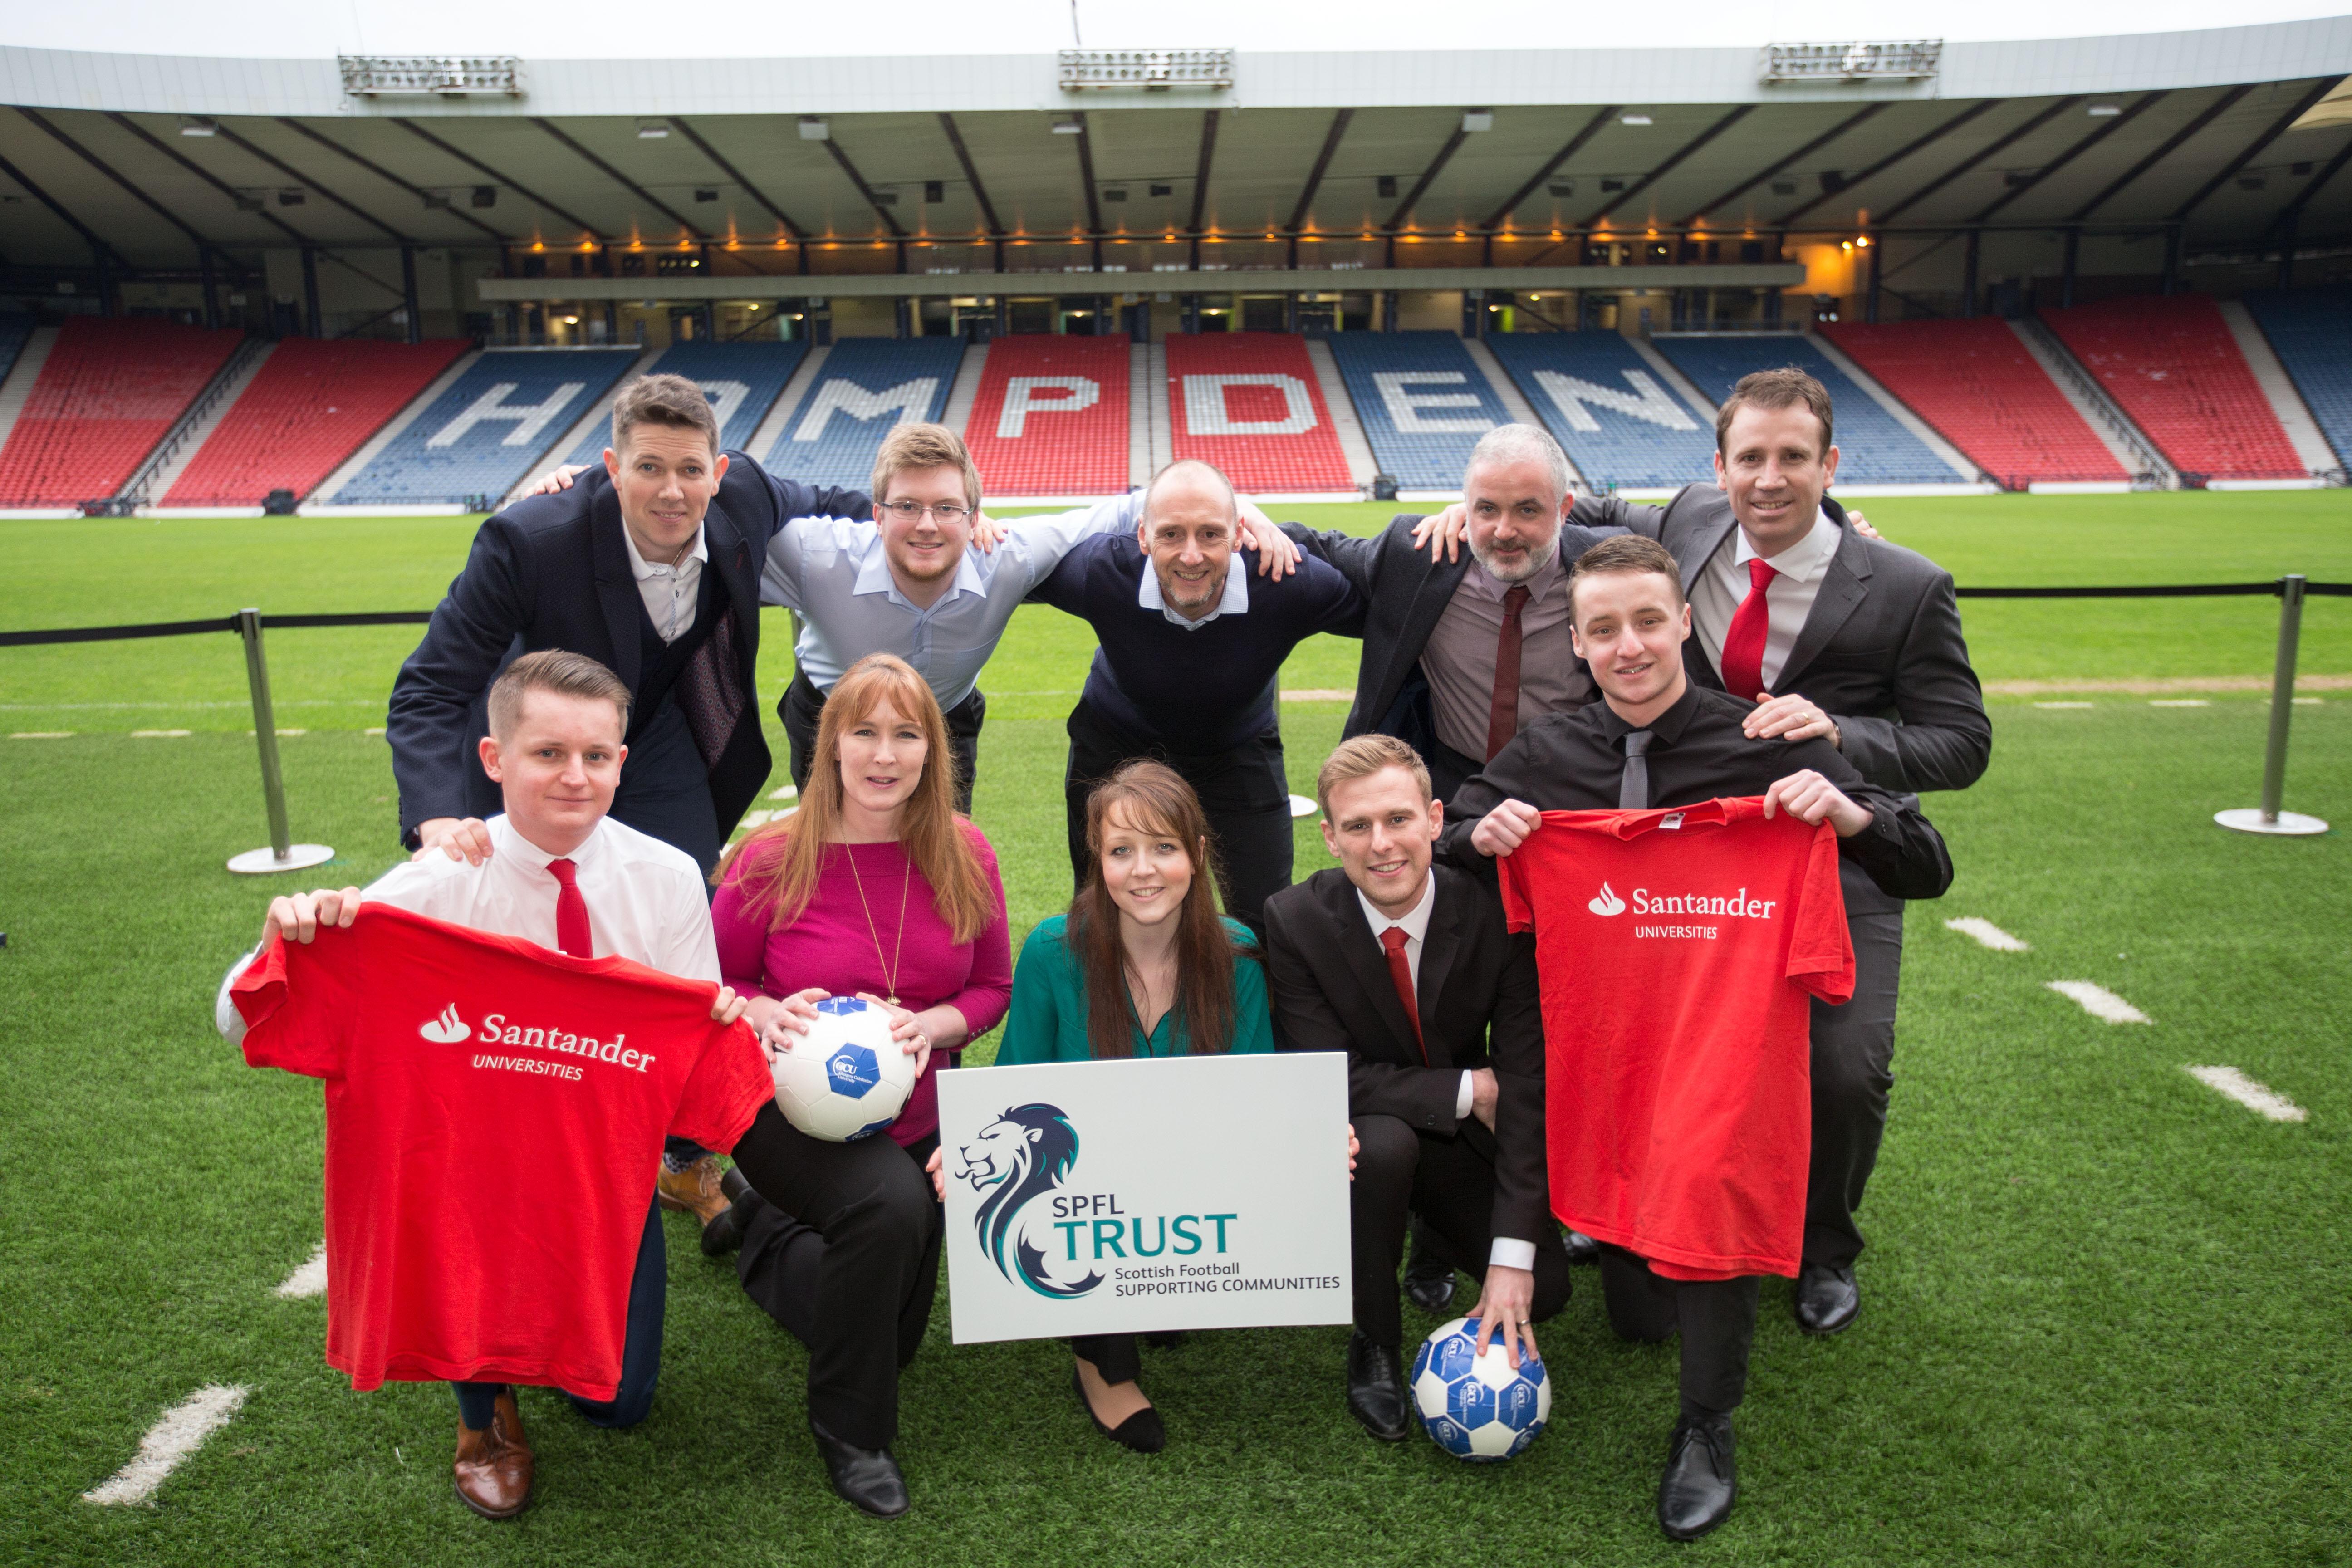 GCU Santander and SPFL Trust Pic Peter Devlin